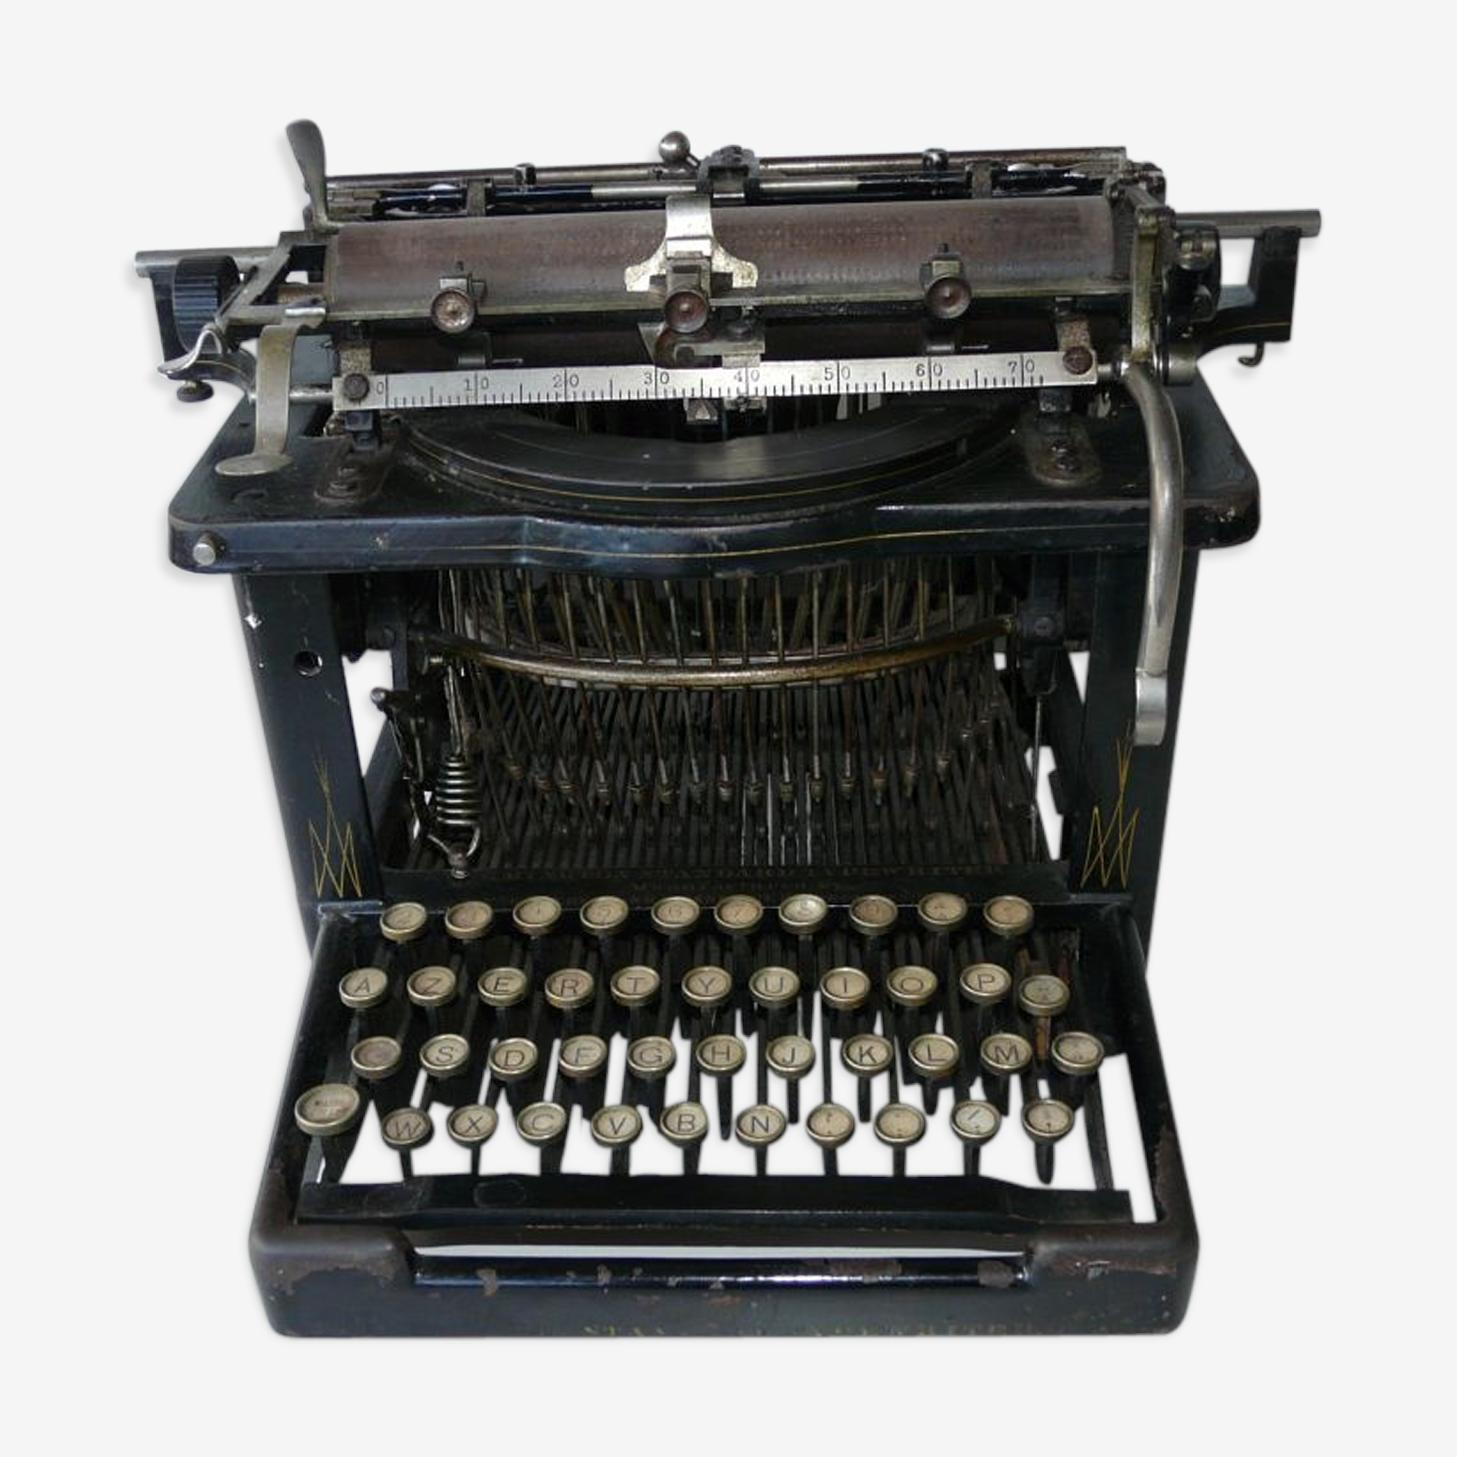 Machine à écrire Remington standart tapewriter n°7 1908